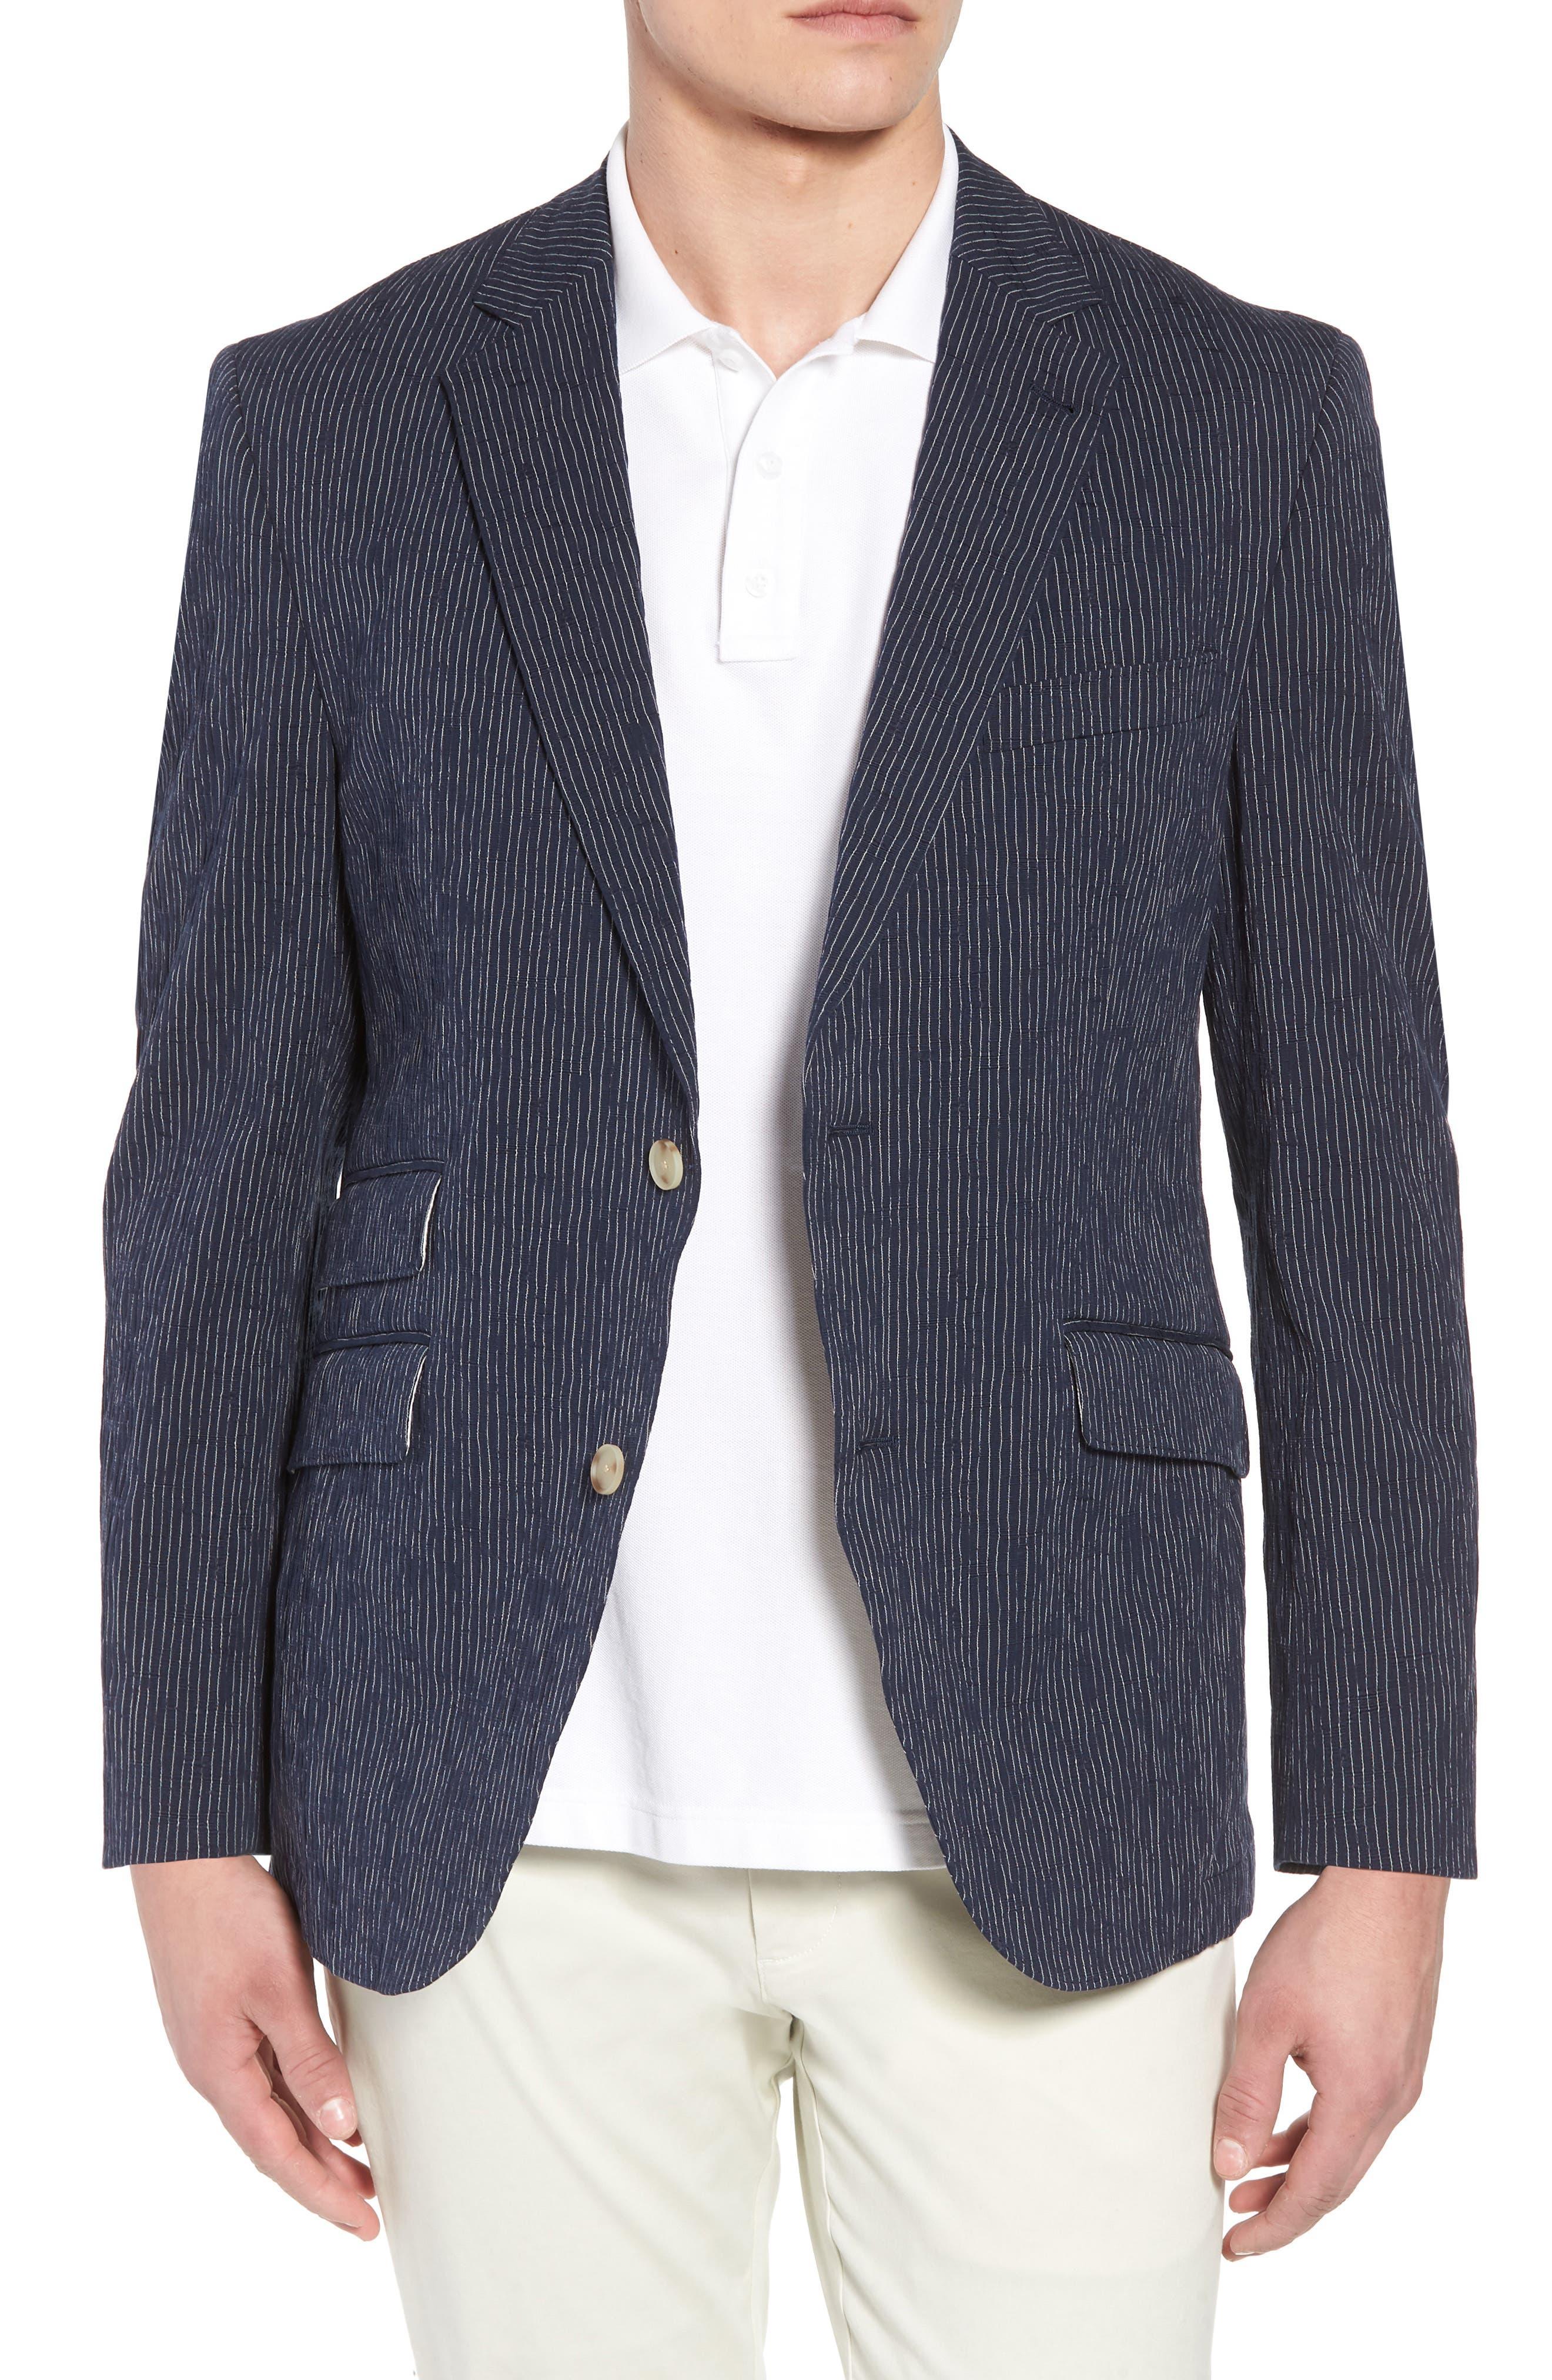 Kroon Sting AIM Classic Fit Stretch Stripe Cotton Sport Coat